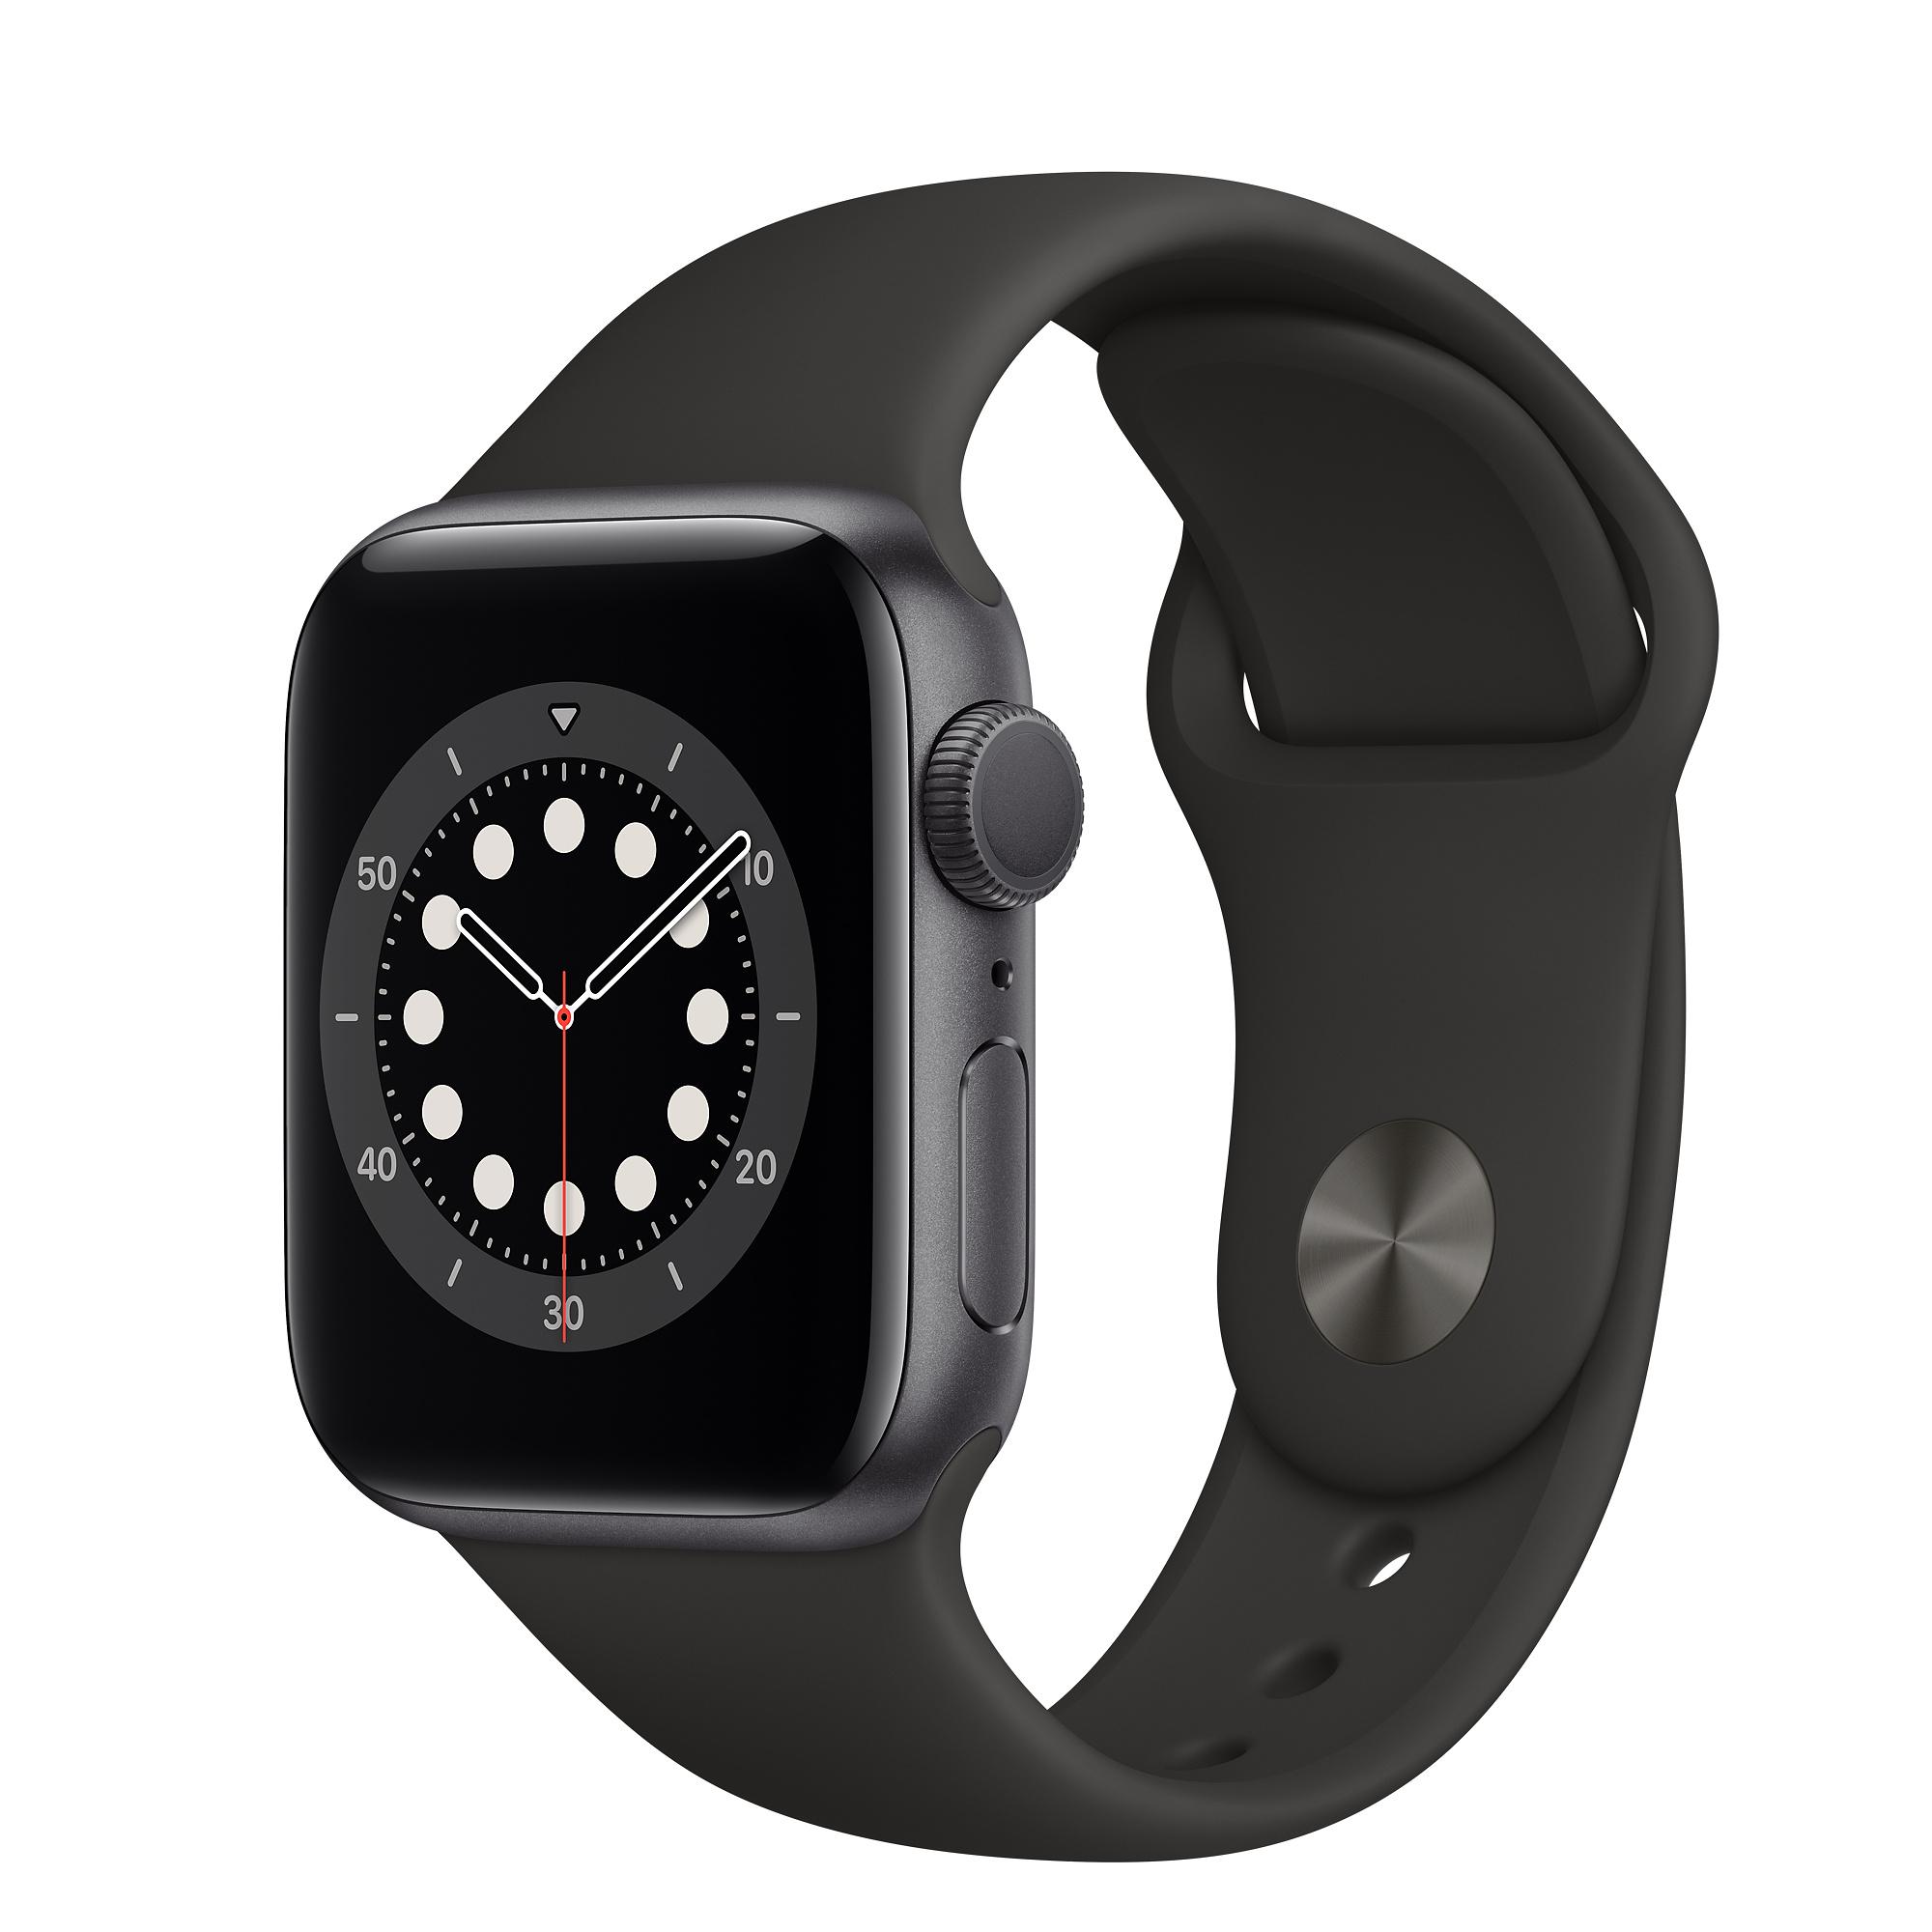 APPLE Watch S6 Alu 40mm Spacegrey (Bracelet Black) iOS